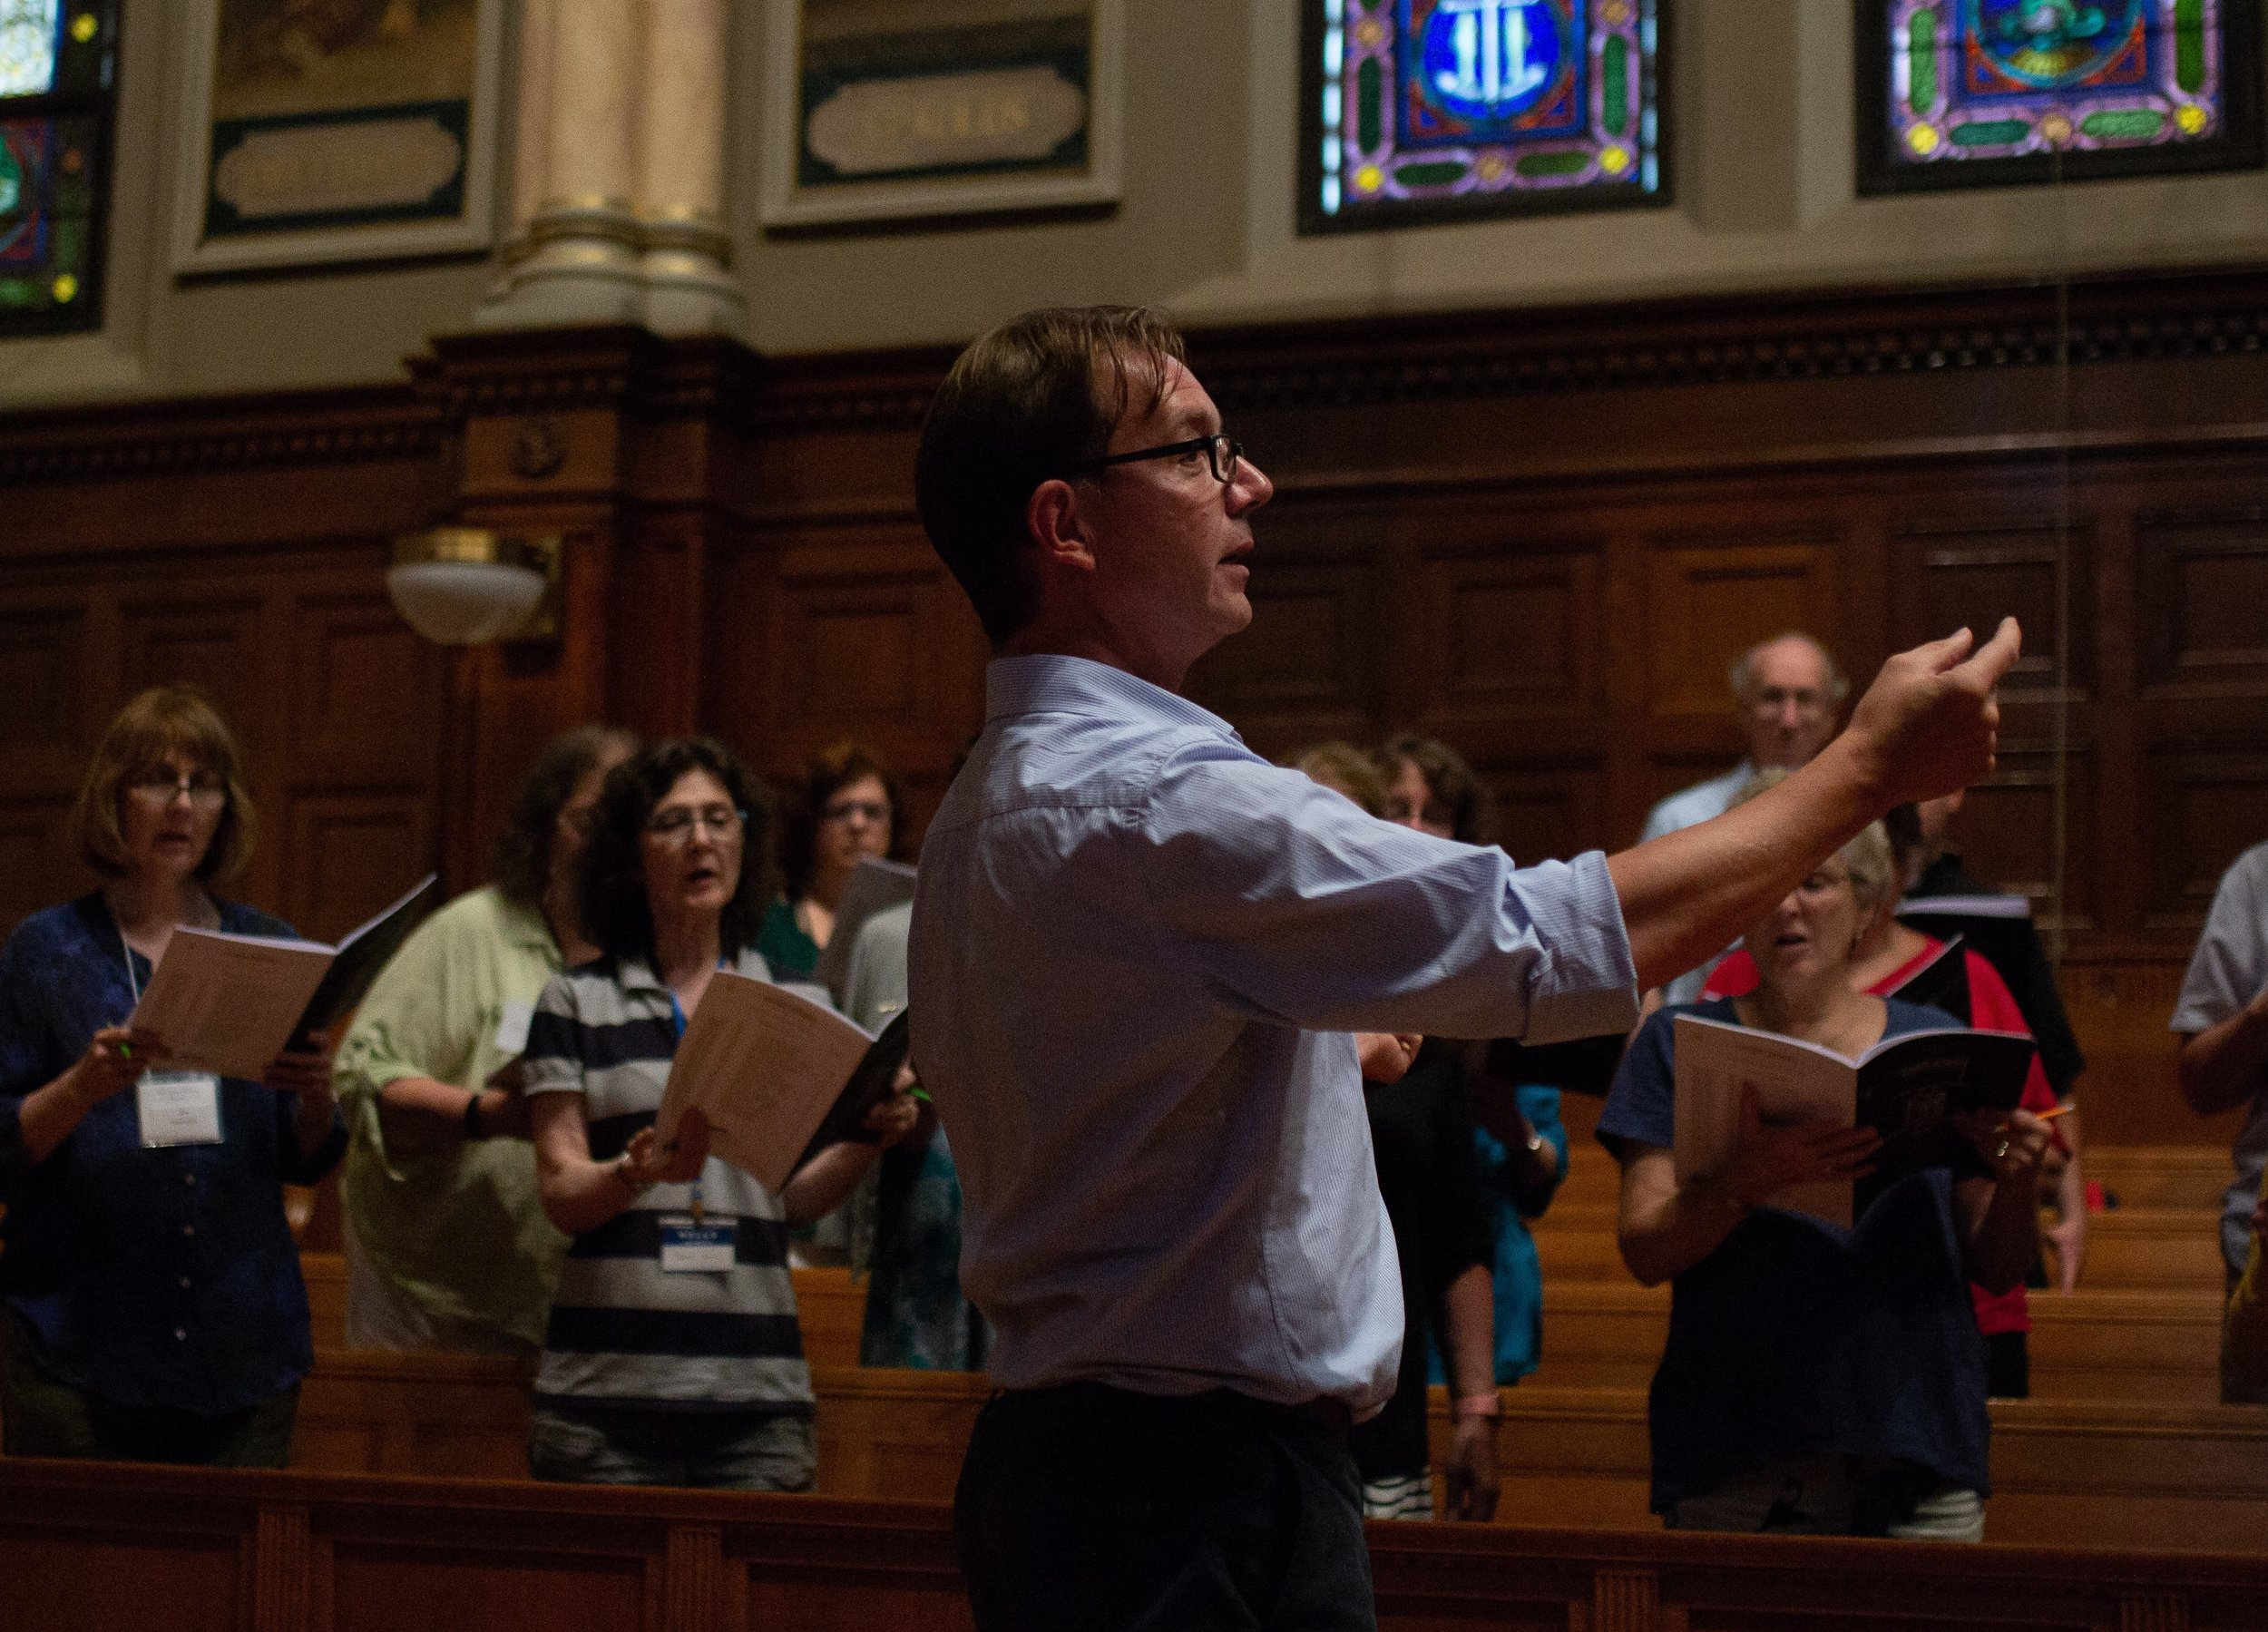 David rehearsal in chapel 2.jpg